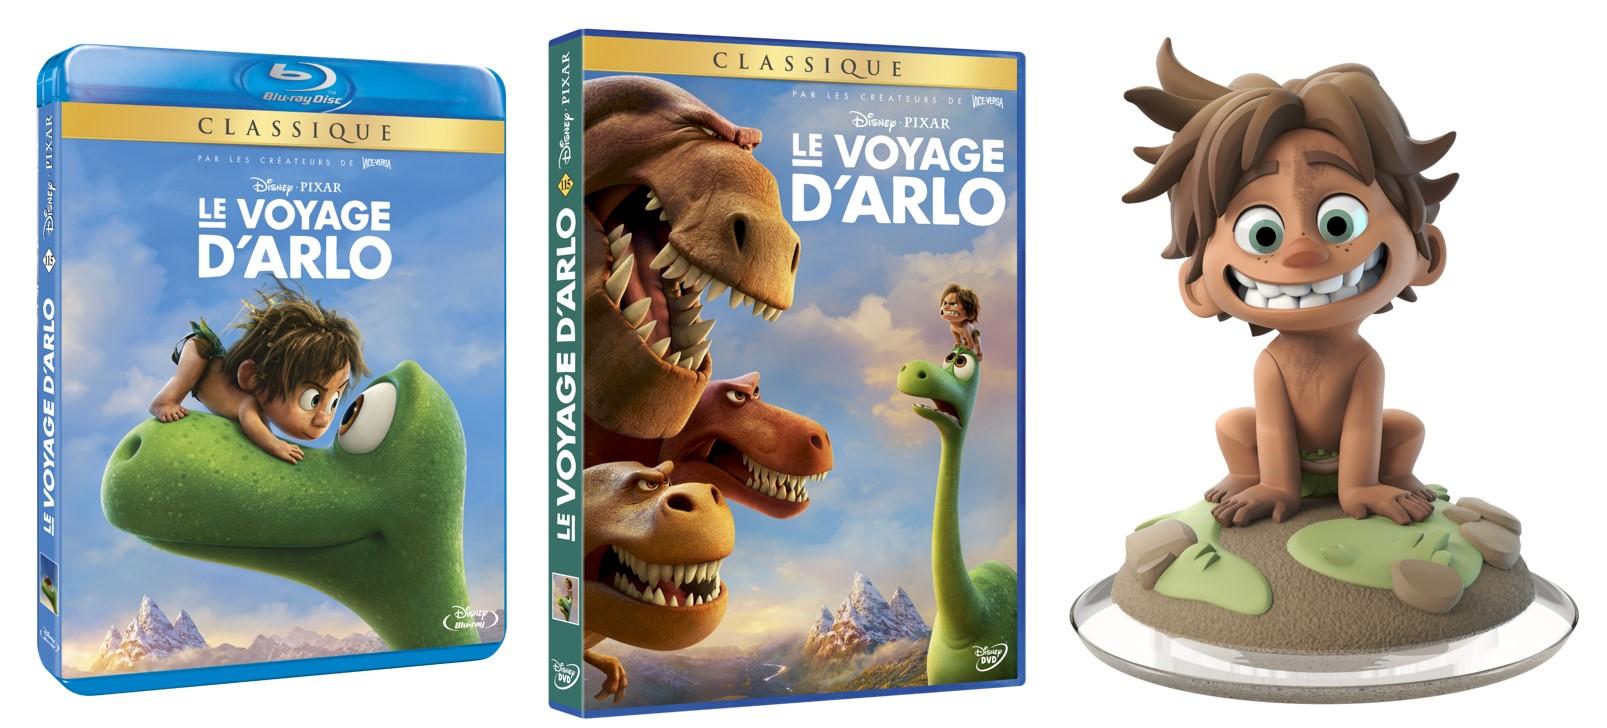 LE VOYAGE D'ARLO - Visuel Concours TOUTES DOTATIONS Sortie BR DVD - Go with the Blog